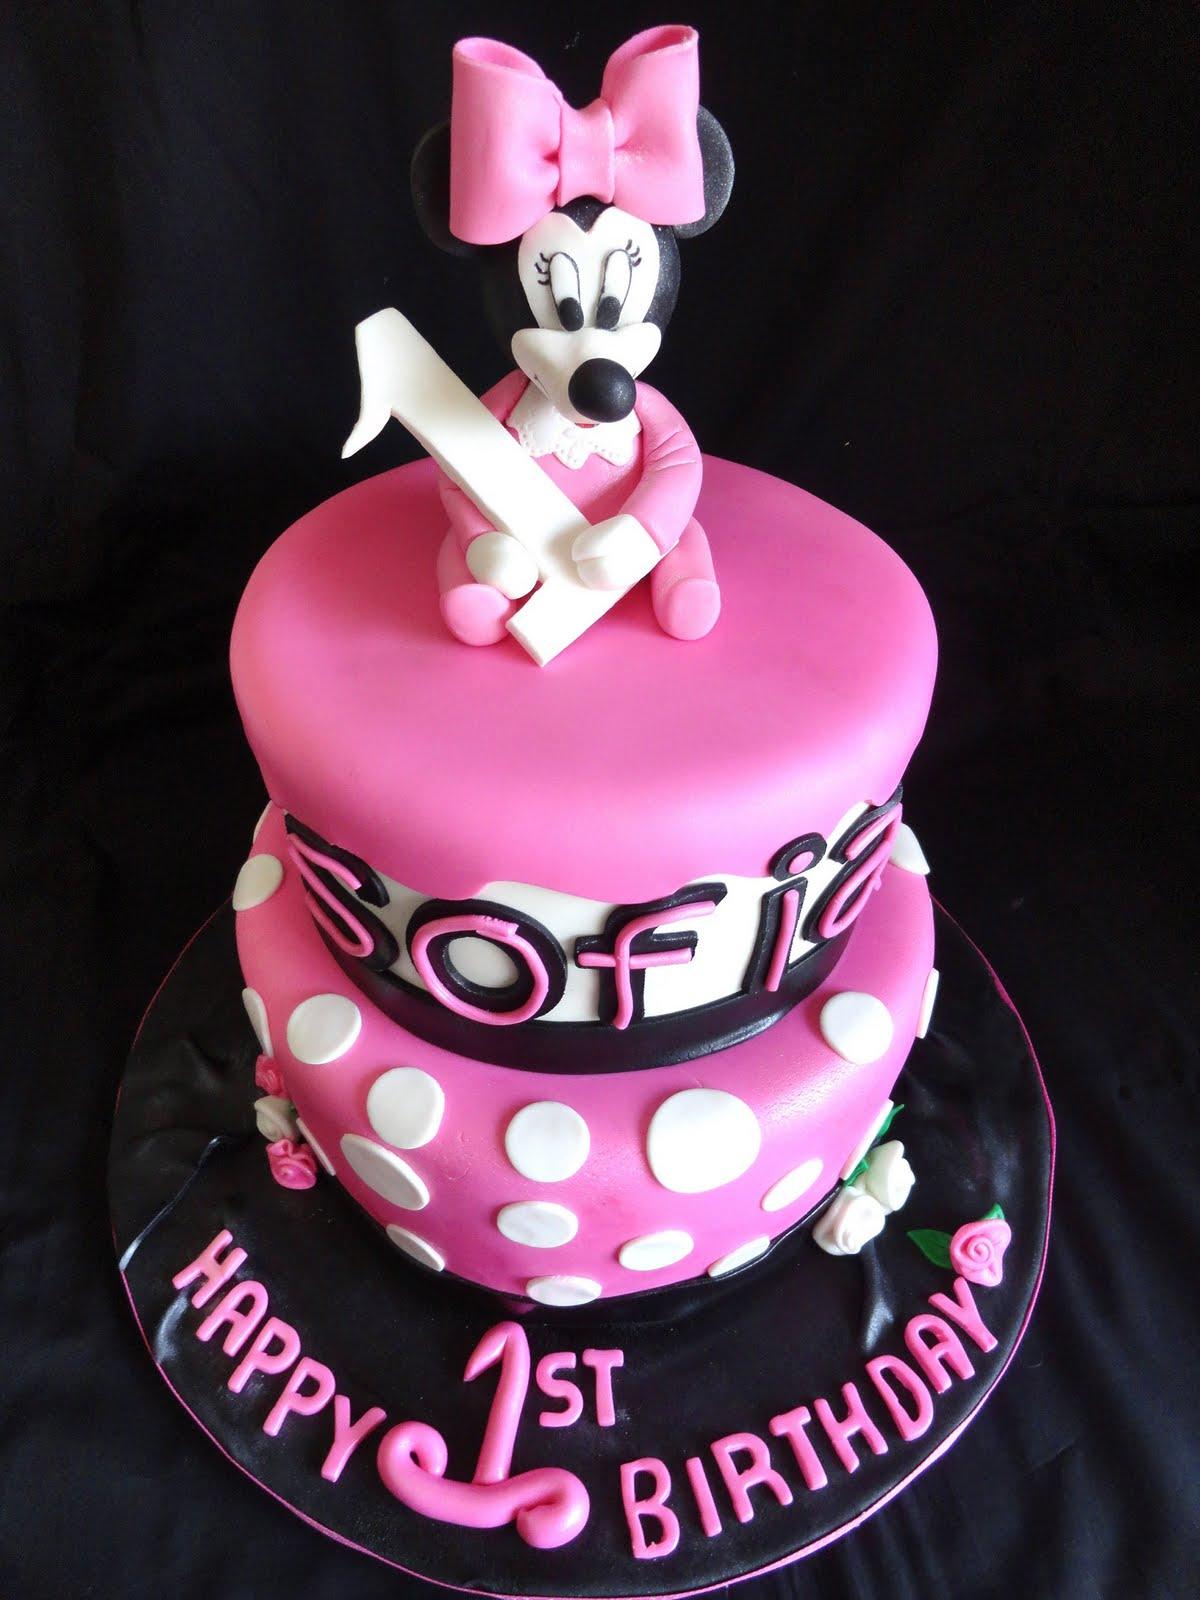 http://3.bp.blogspot.com/-IQqbpwTpX7o/Tjm8p6guOII/AAAAAAAACwU/g6LNDFOL3TE/s1600/Minnie+Cake+3.JPG